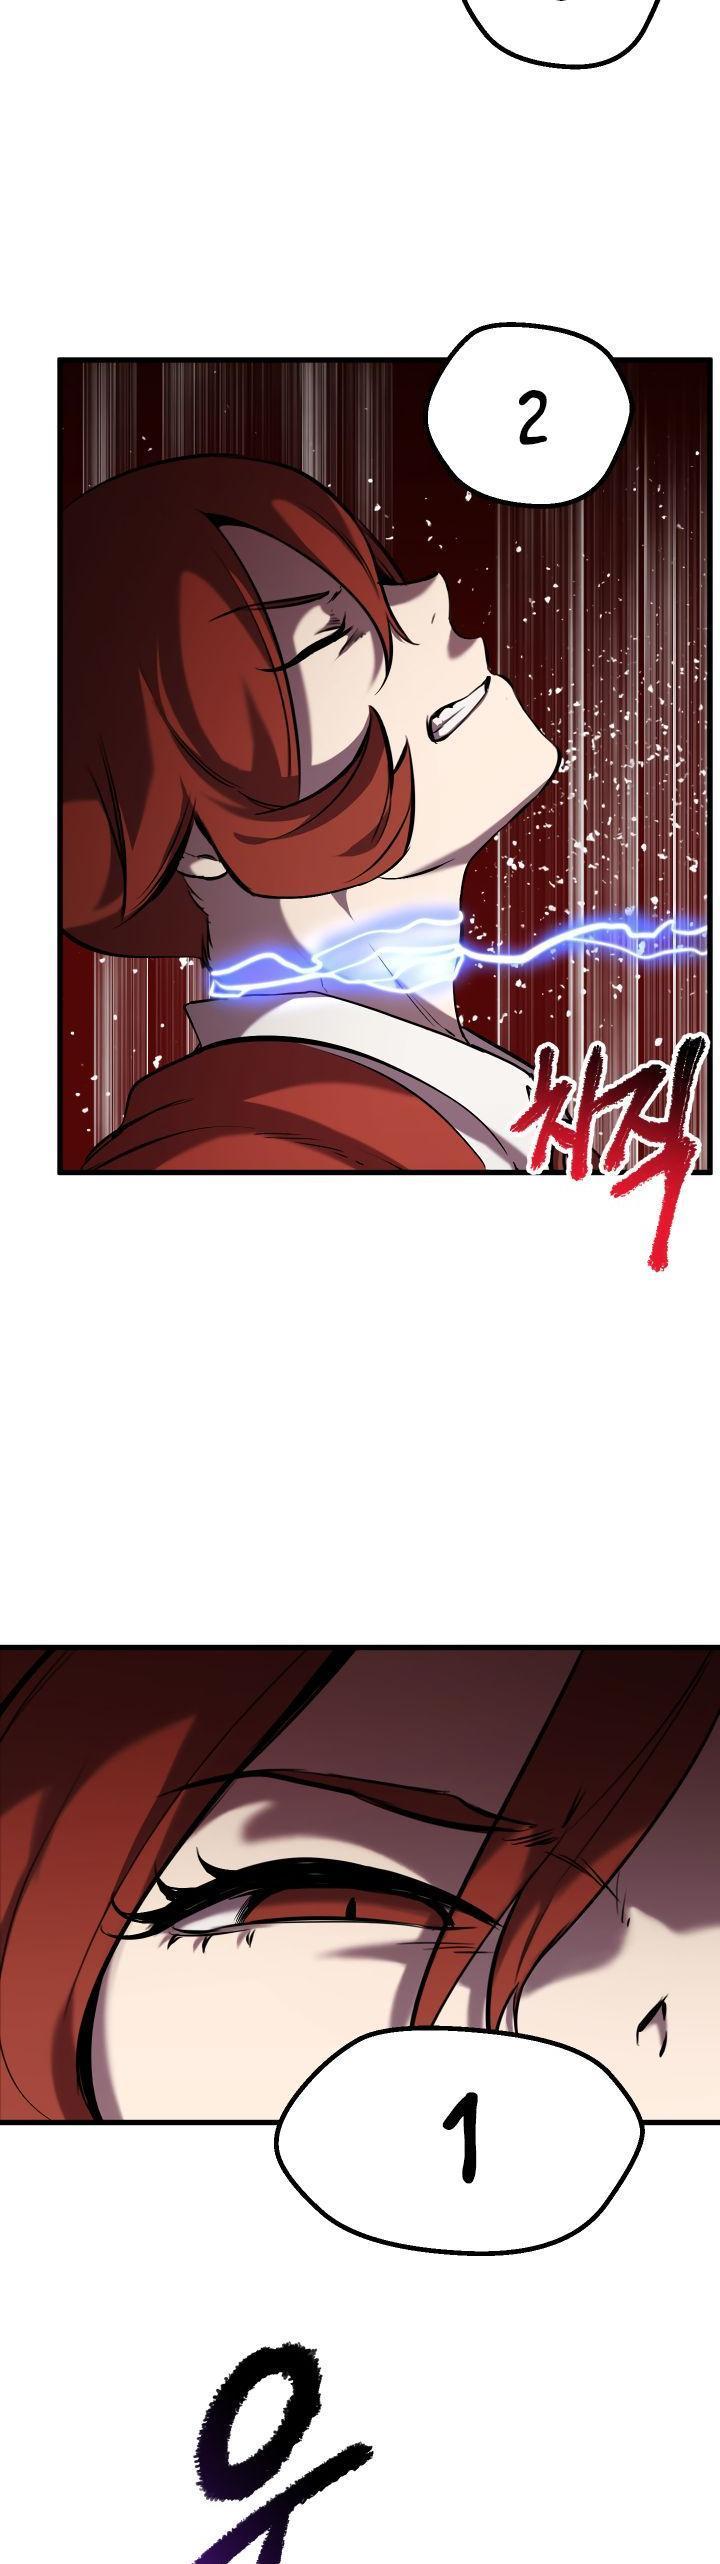 Survival Story Of A Sword King In A Fantasy World Chapter 34 page 41 - Mangakakalots.com